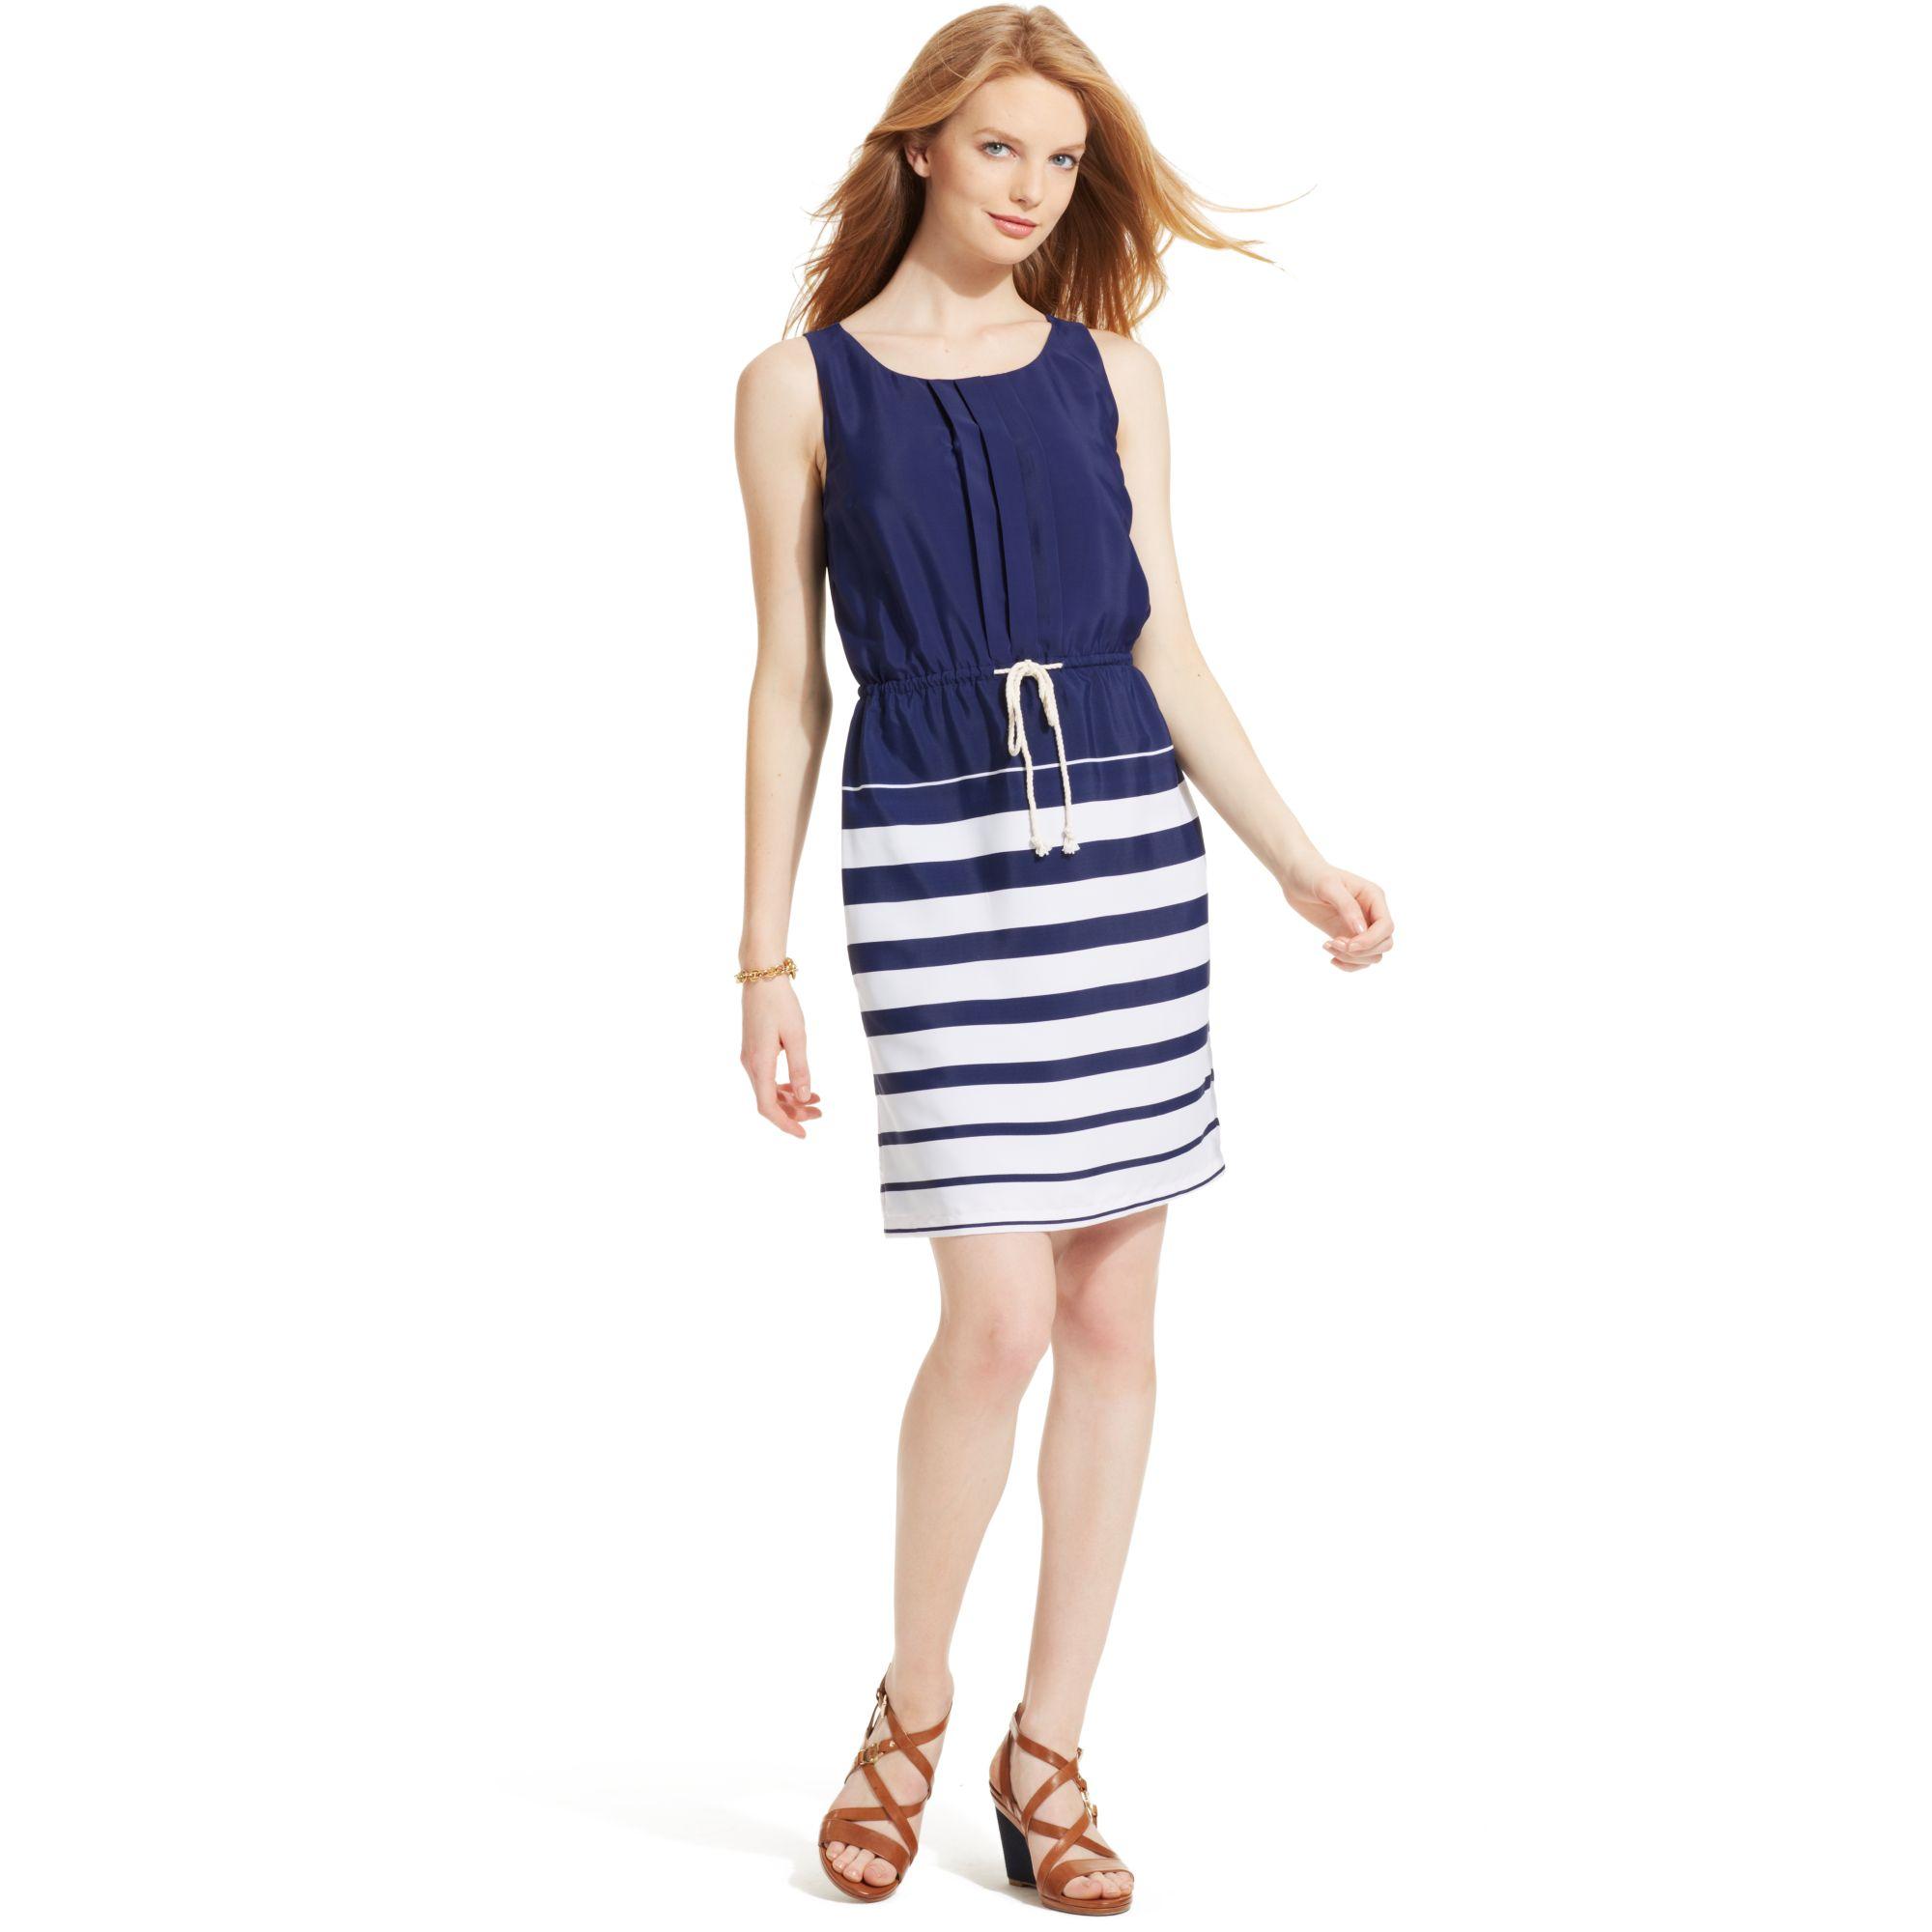 Lyst - Tommy Hilfiger Sleeveless Striped Dress in Blue